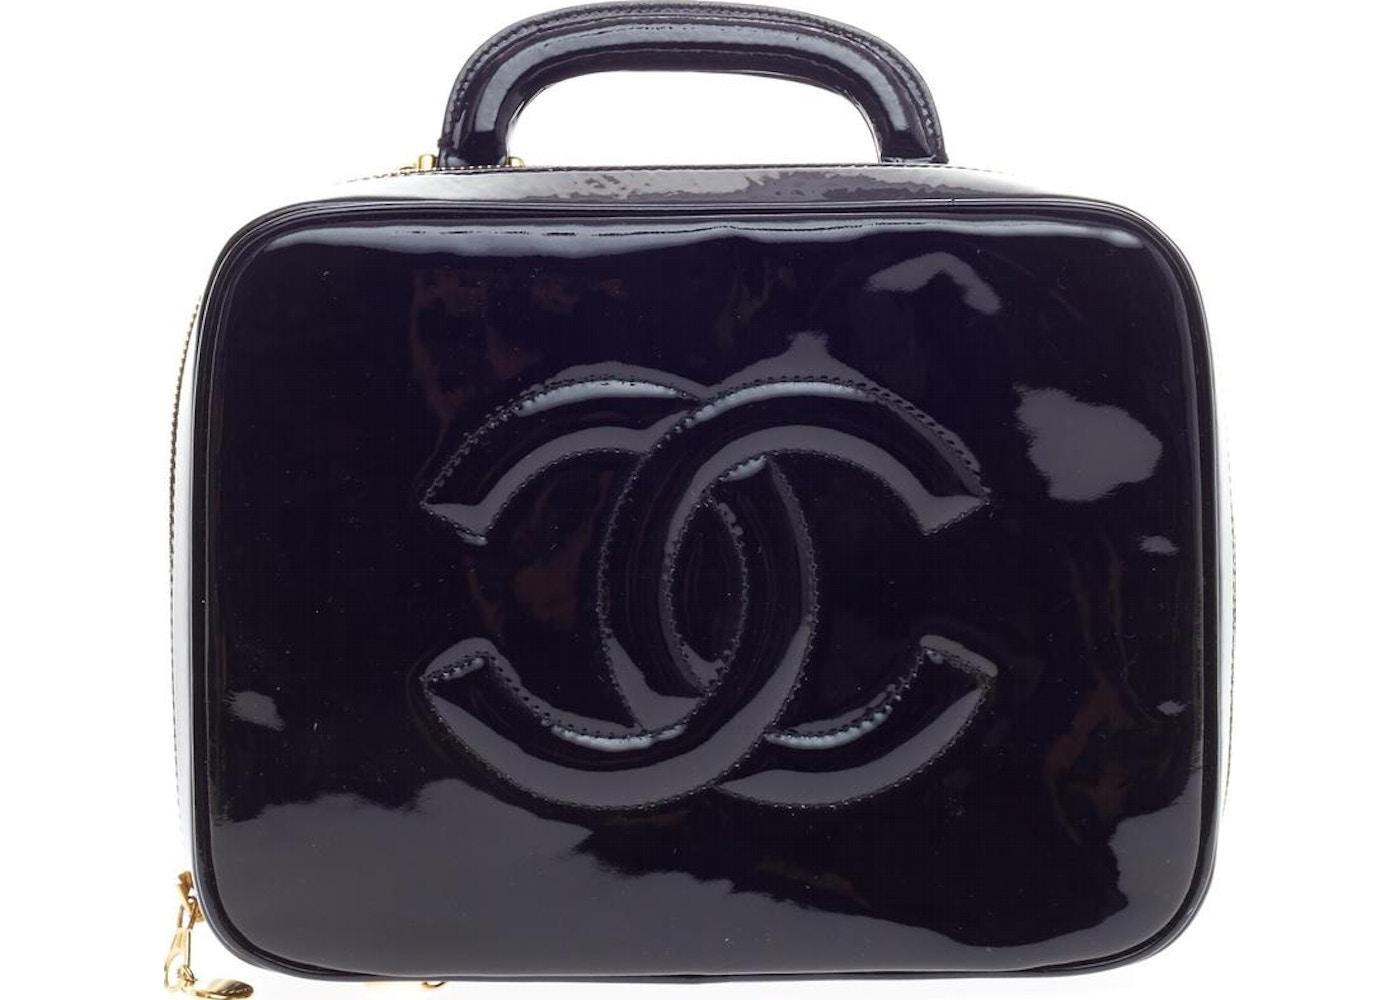 383870b0931 Chanel CC Strap Cosmetic Case Black. Black